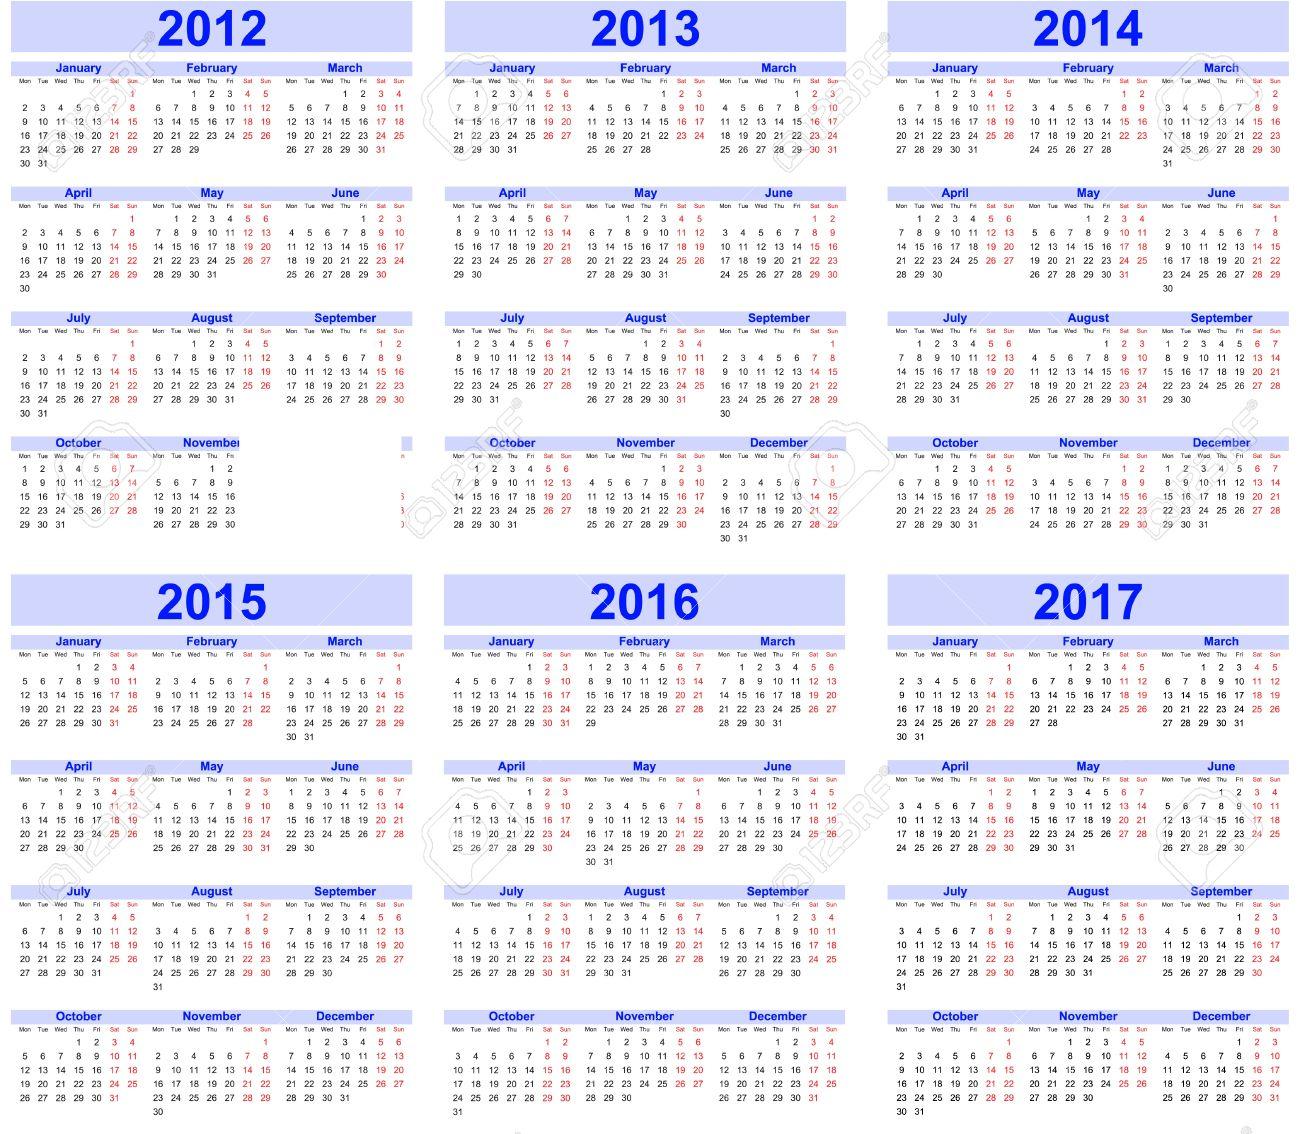 Calendar 2012, 2013, 2014, 2015, 2016, 2017 Royalty Free Cliparts ...